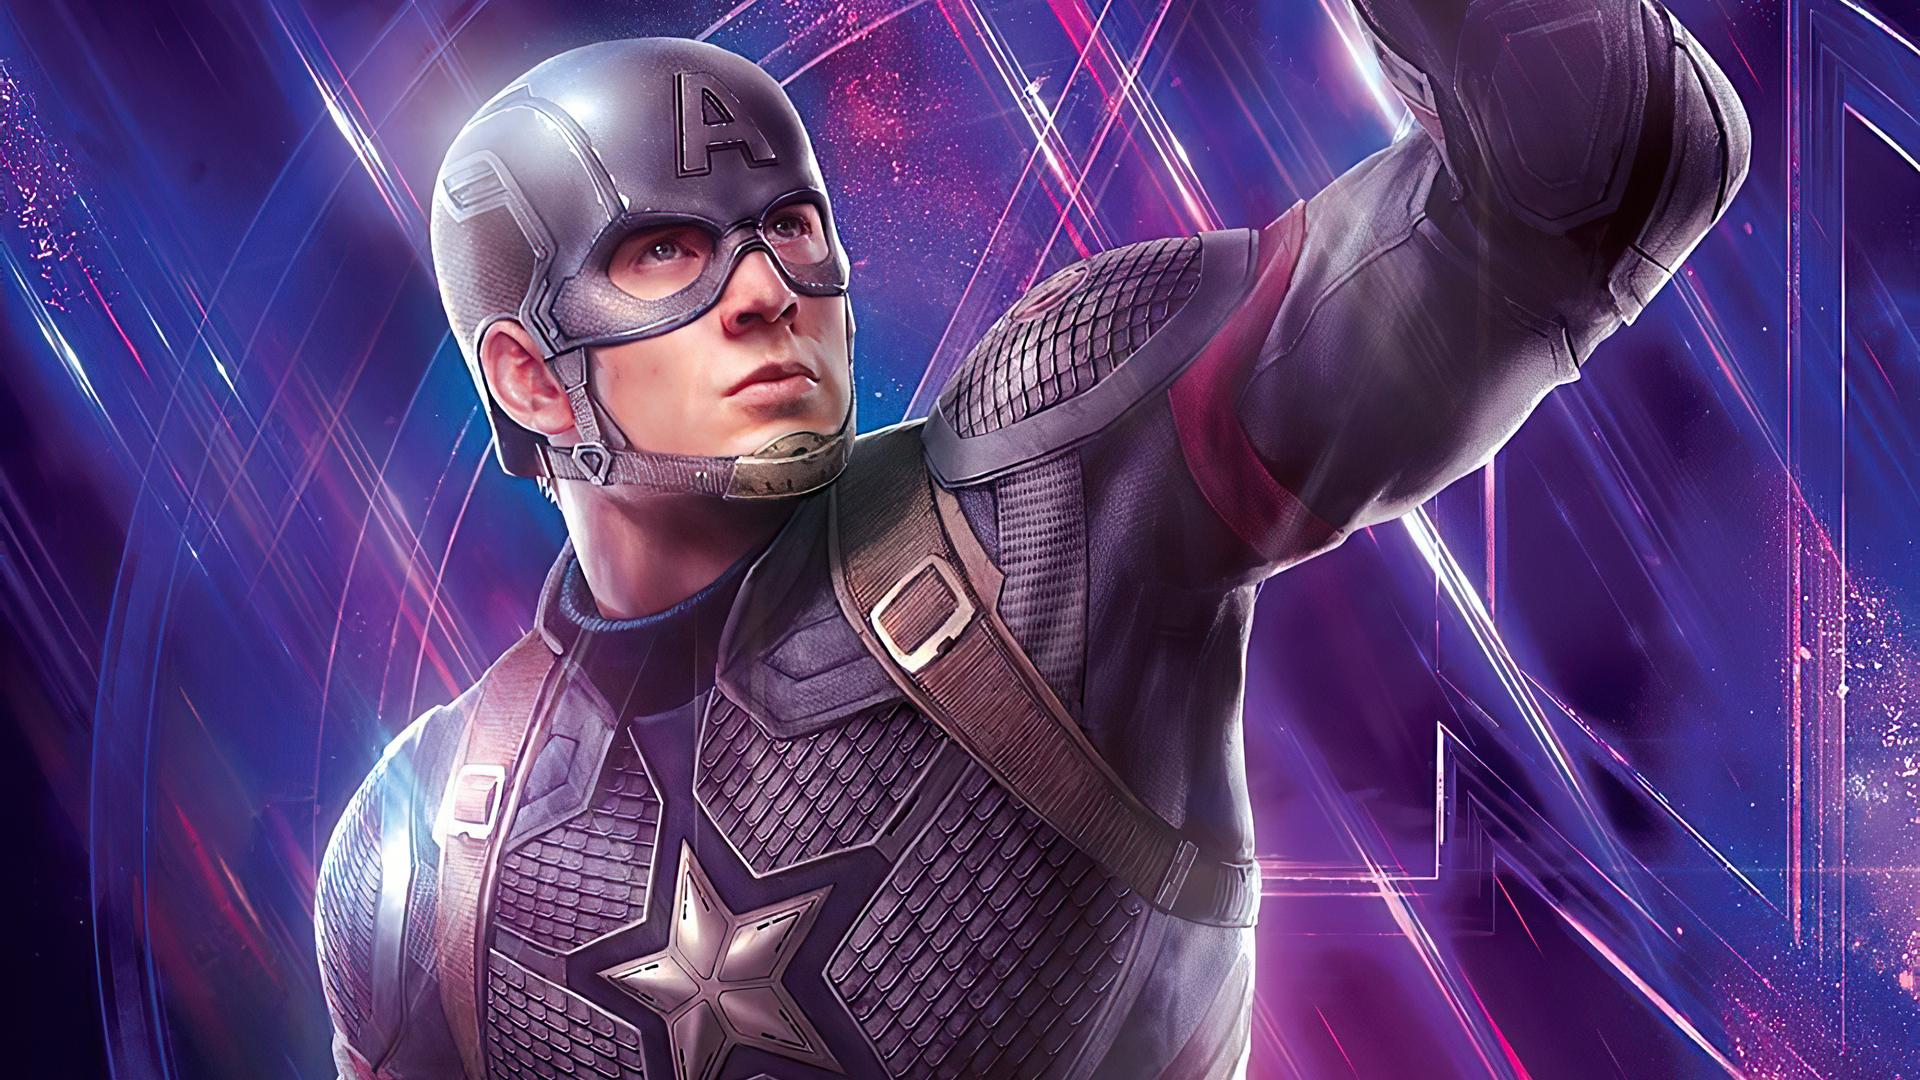 1920x1080 Captain America 2020 New Laptop Full HD 1080P HD ...